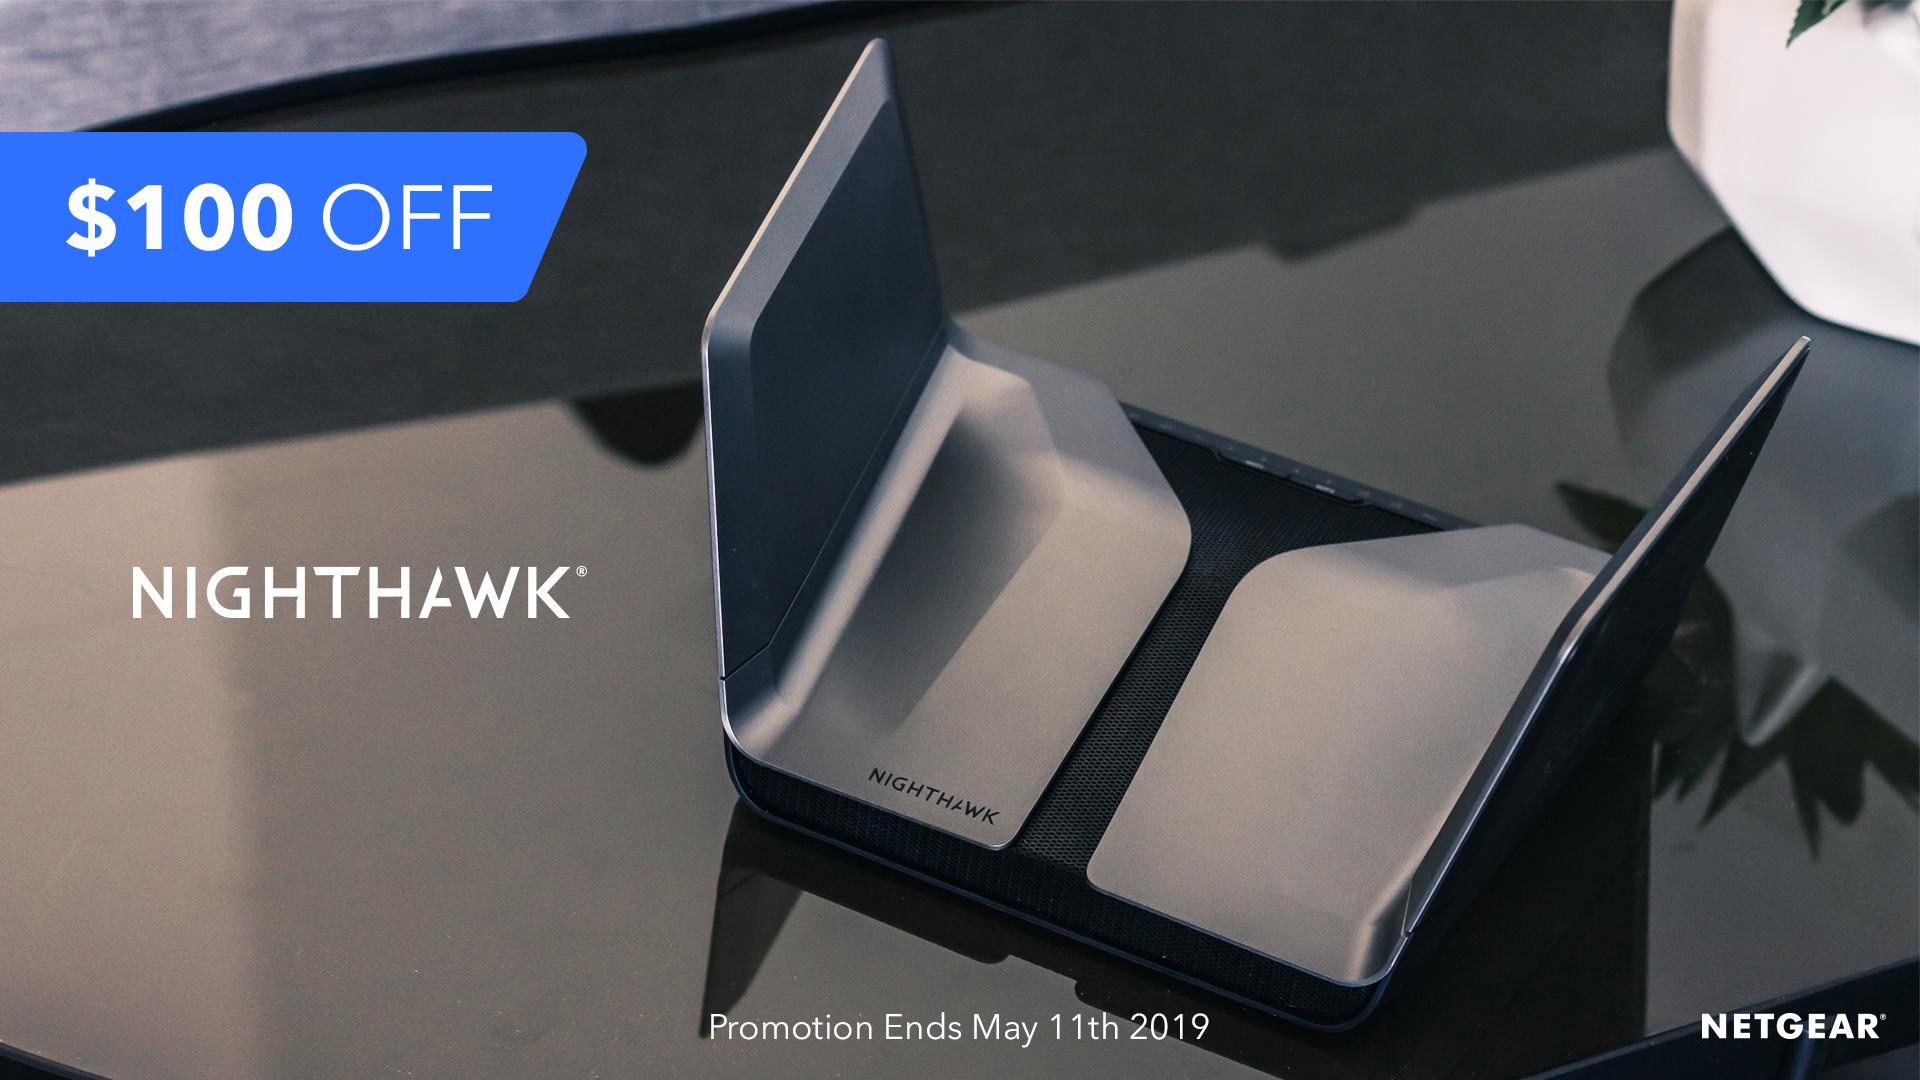 Take $100 Off Nighthawk AX12 & AX8 and Upgrade to     - NETGEAR